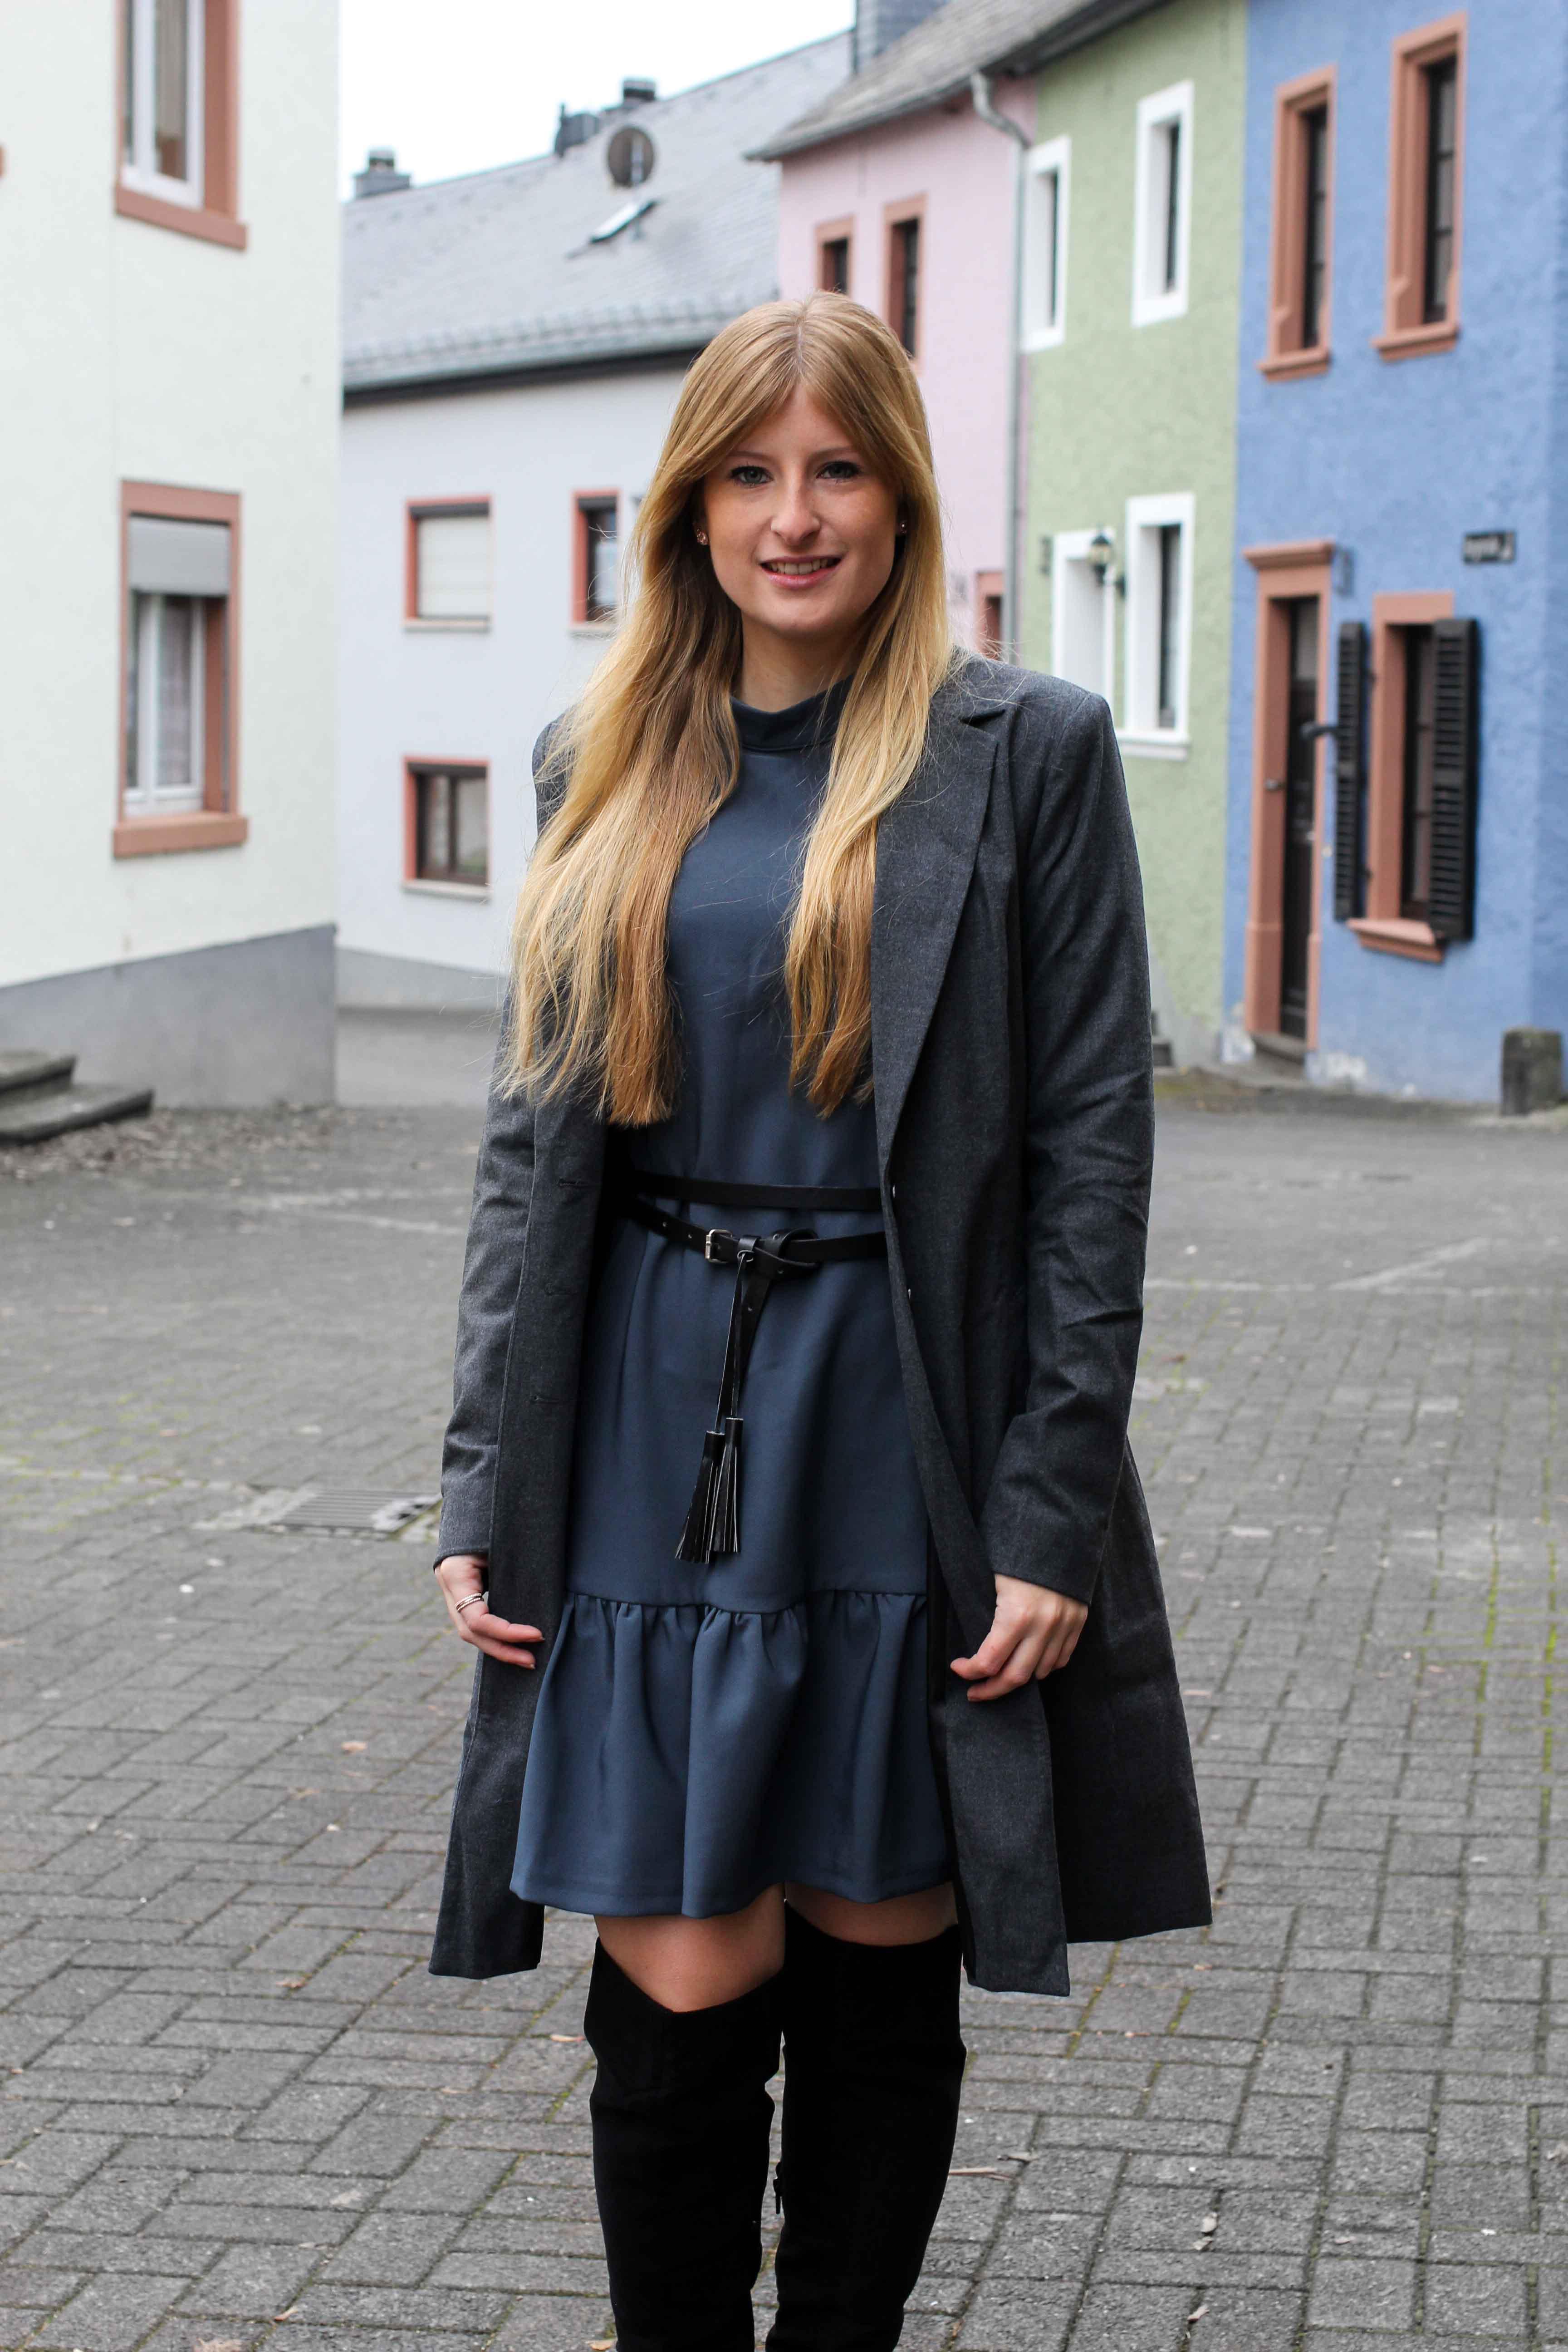 Blaues Winterkleid Closet London schwarze Overknees grauer Mantel Winter Outfit Modeblog 6